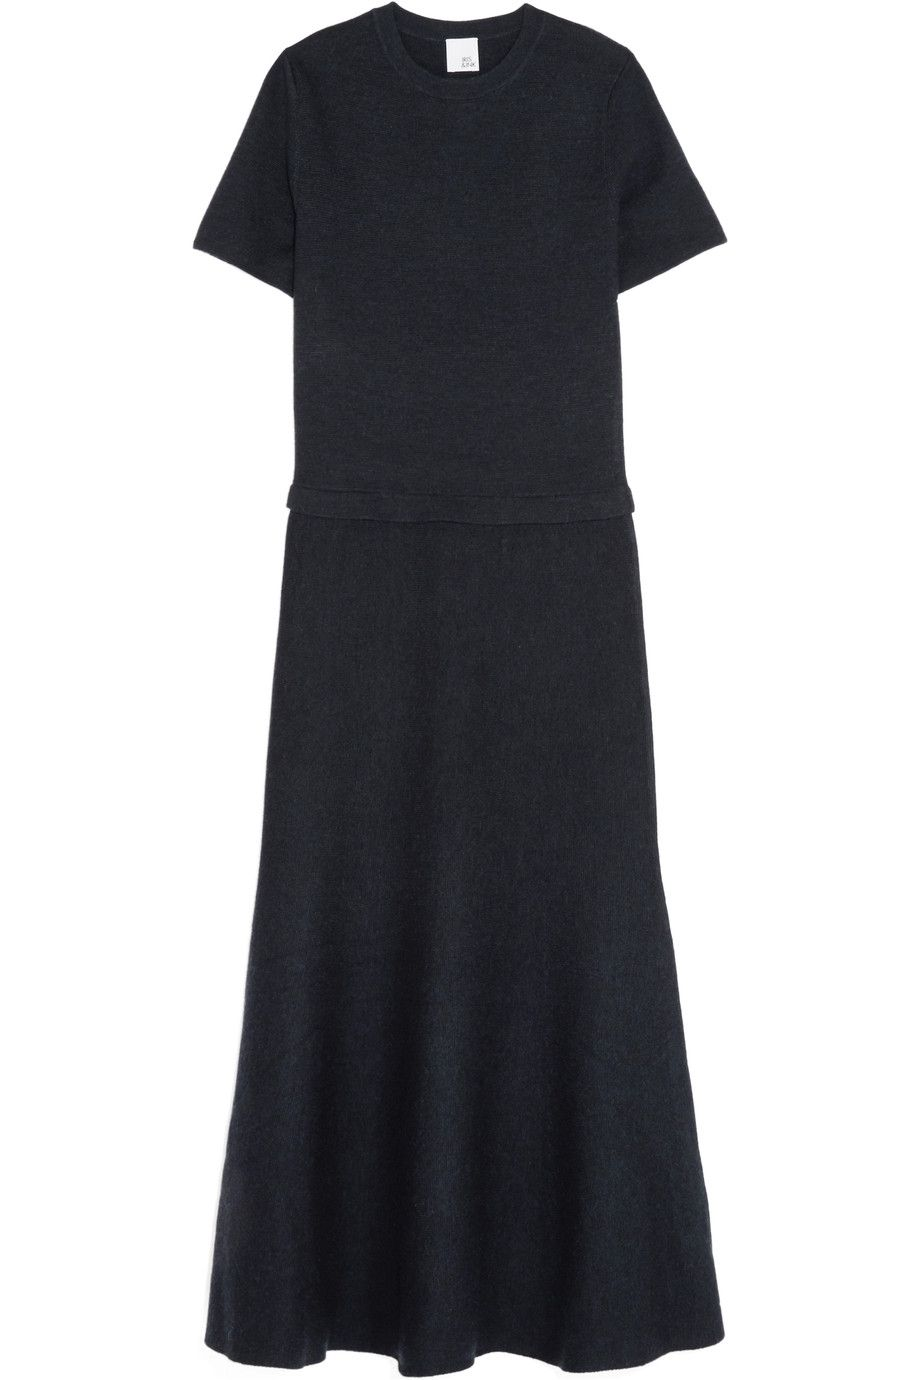 Shop onsale iris and ink tilda milanoknit wool midi dress browse